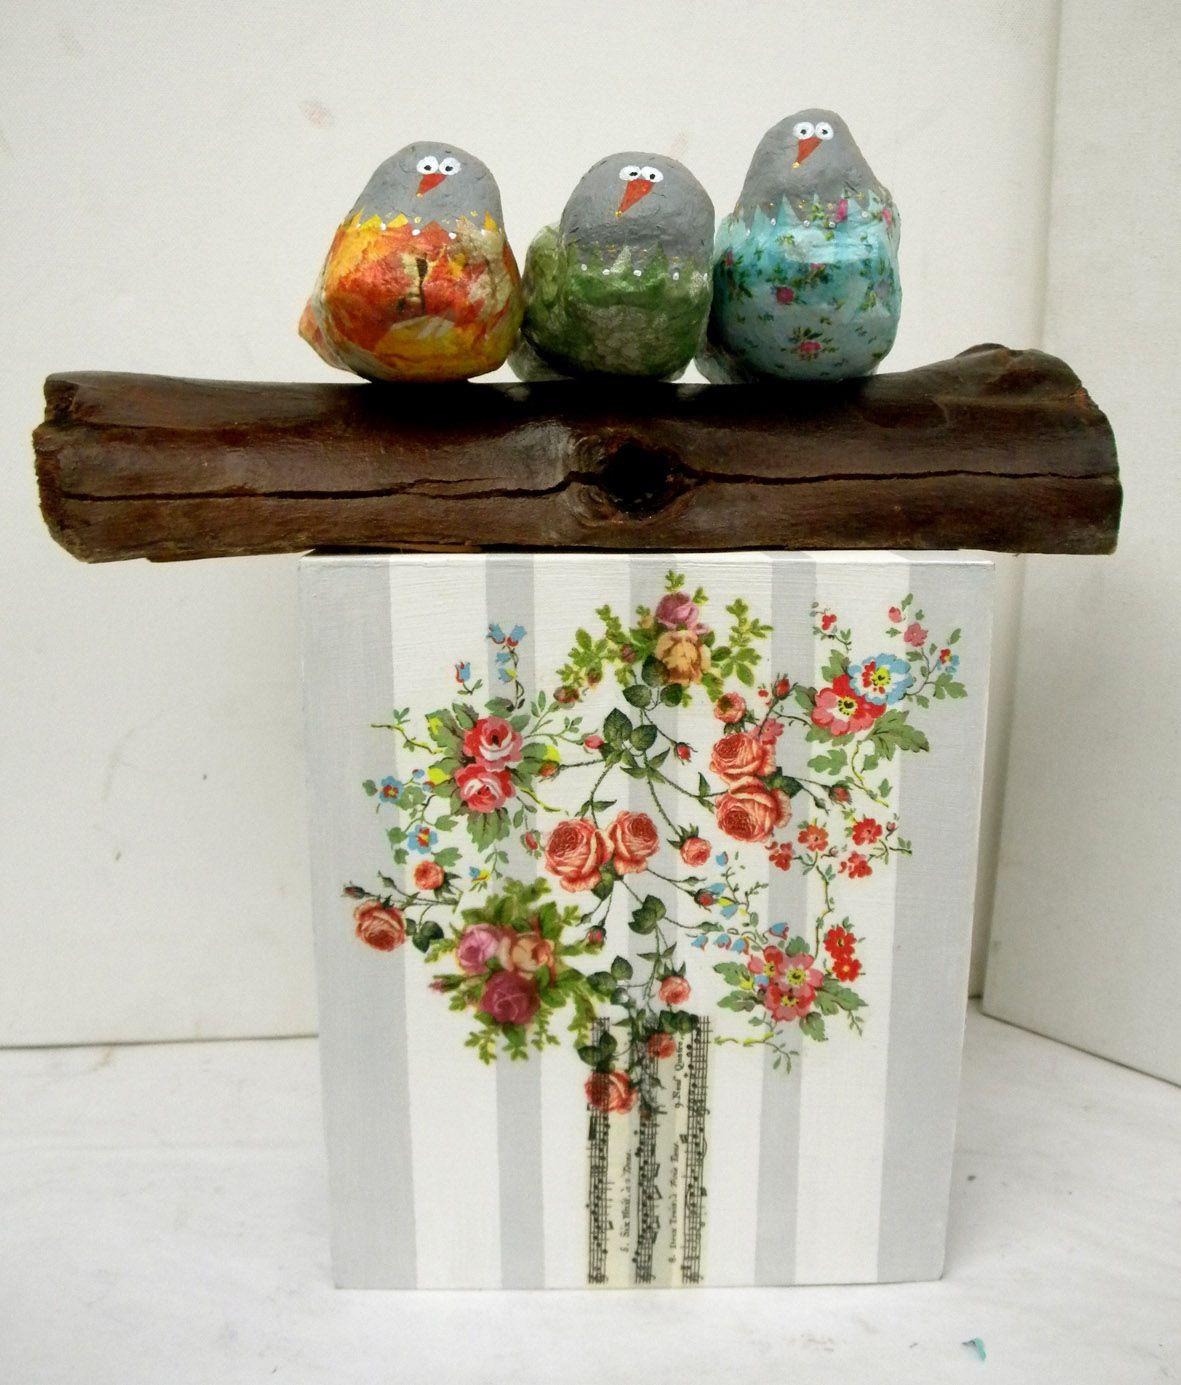 Connie Achurra Deco Arte Muebles: Pin De Connie Achurra Deco-Arte En Mis Esculturas Www